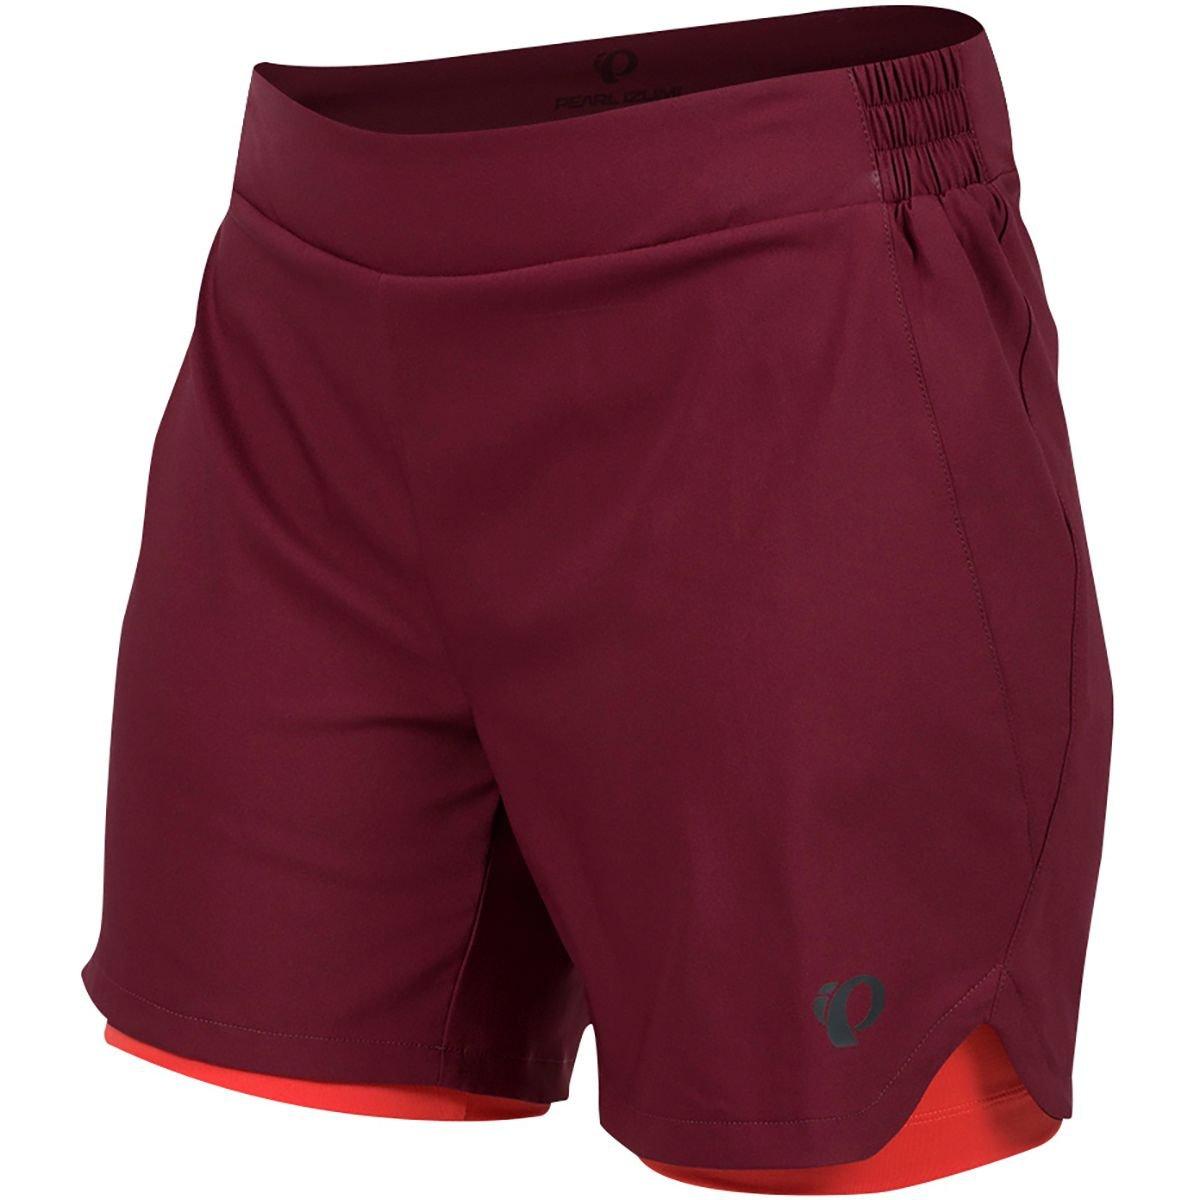 Pearl iZUMi W Journey Shorts, Port/Cayenne, 2